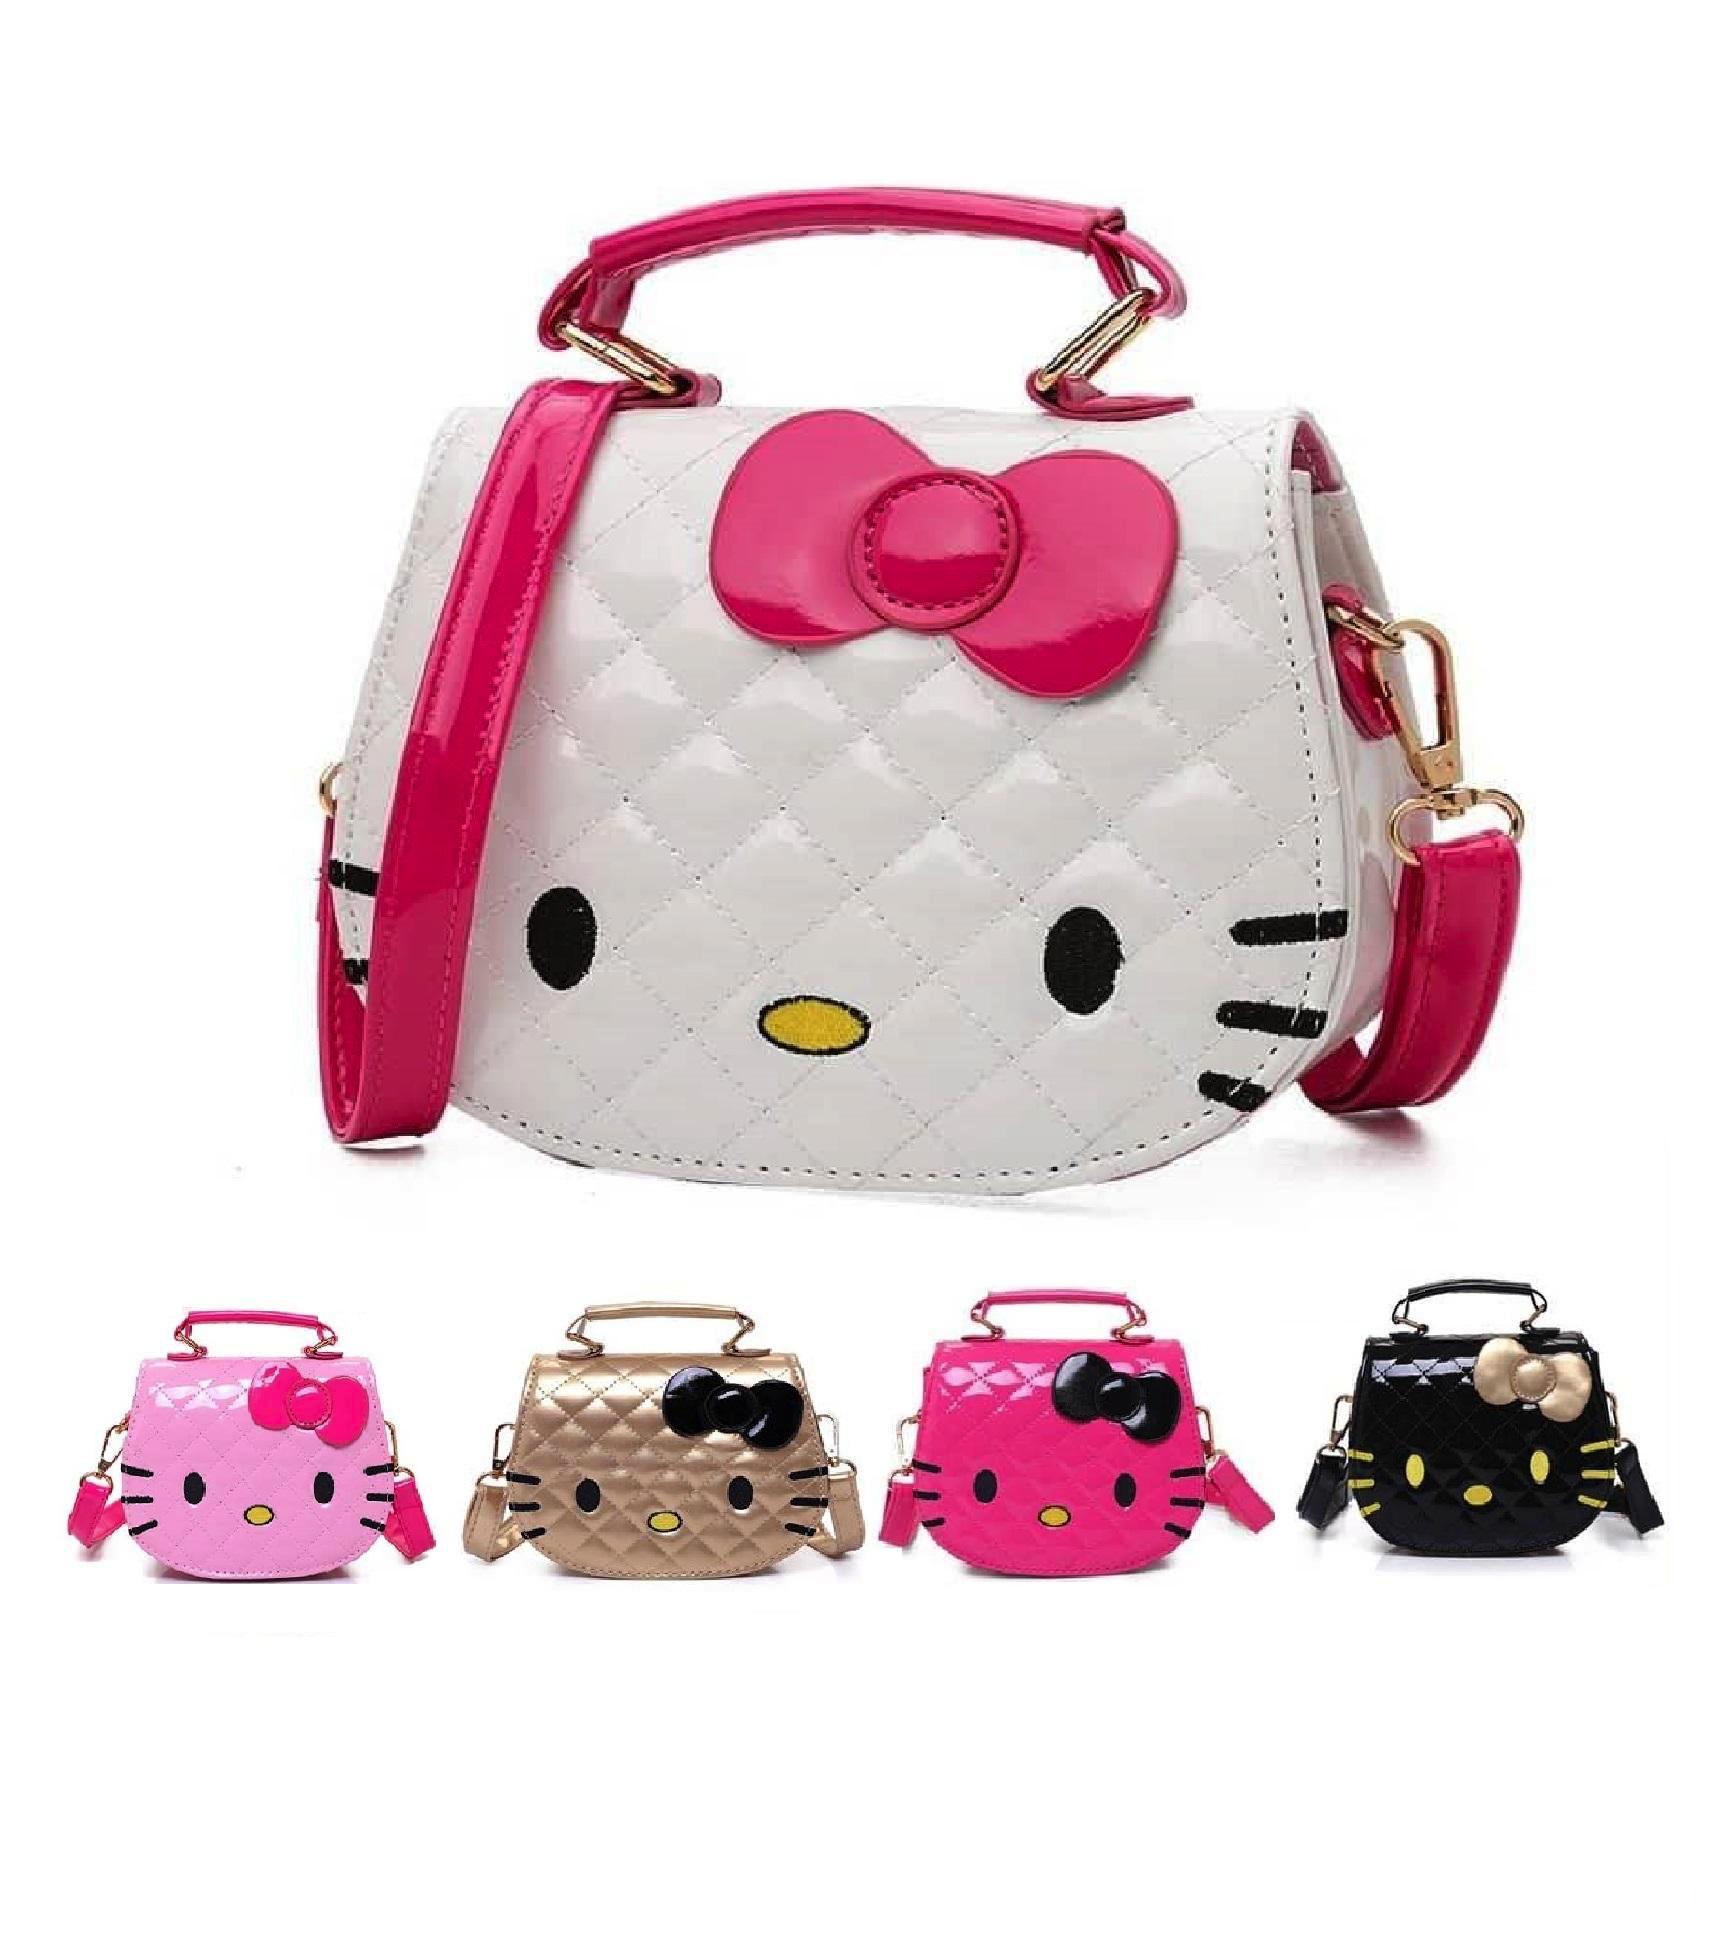 c4168f2a8 Product details of (SUPER DUPER CUTE) WJS Women Kawaii Cute Mini Hello  Kitty Handbag Pretty Bow PU Handbag Hand Bag Kid Girls Bag Sling Bag  Shoulder Bag ...